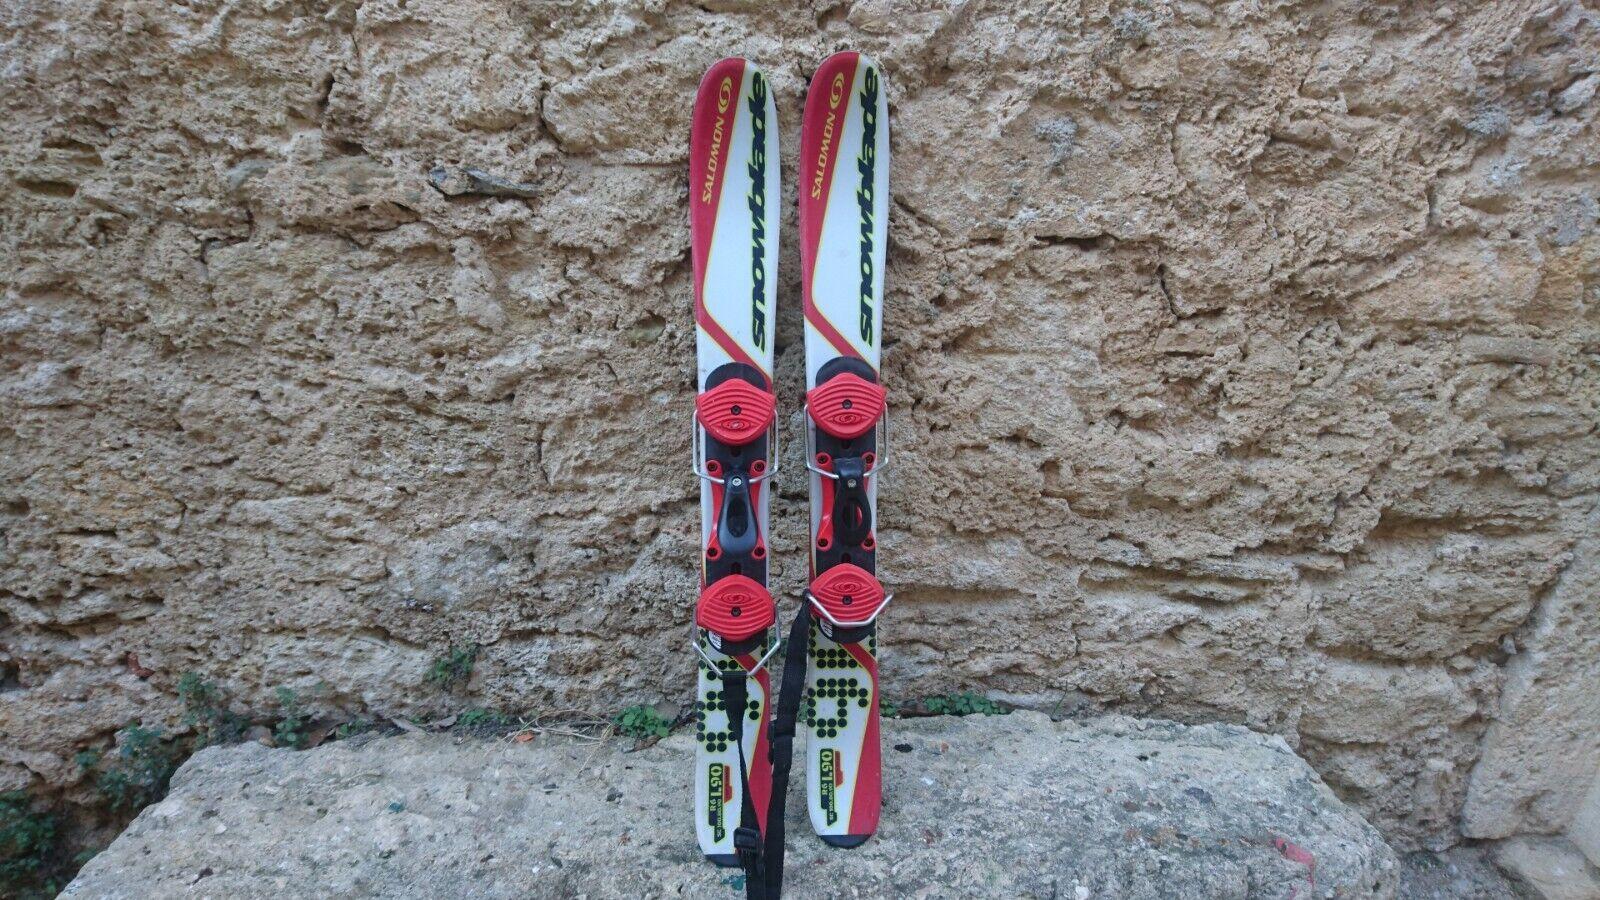 SNOWBLADE SALOMON 90cm PATINETTES MINISKIS MINI SKIS